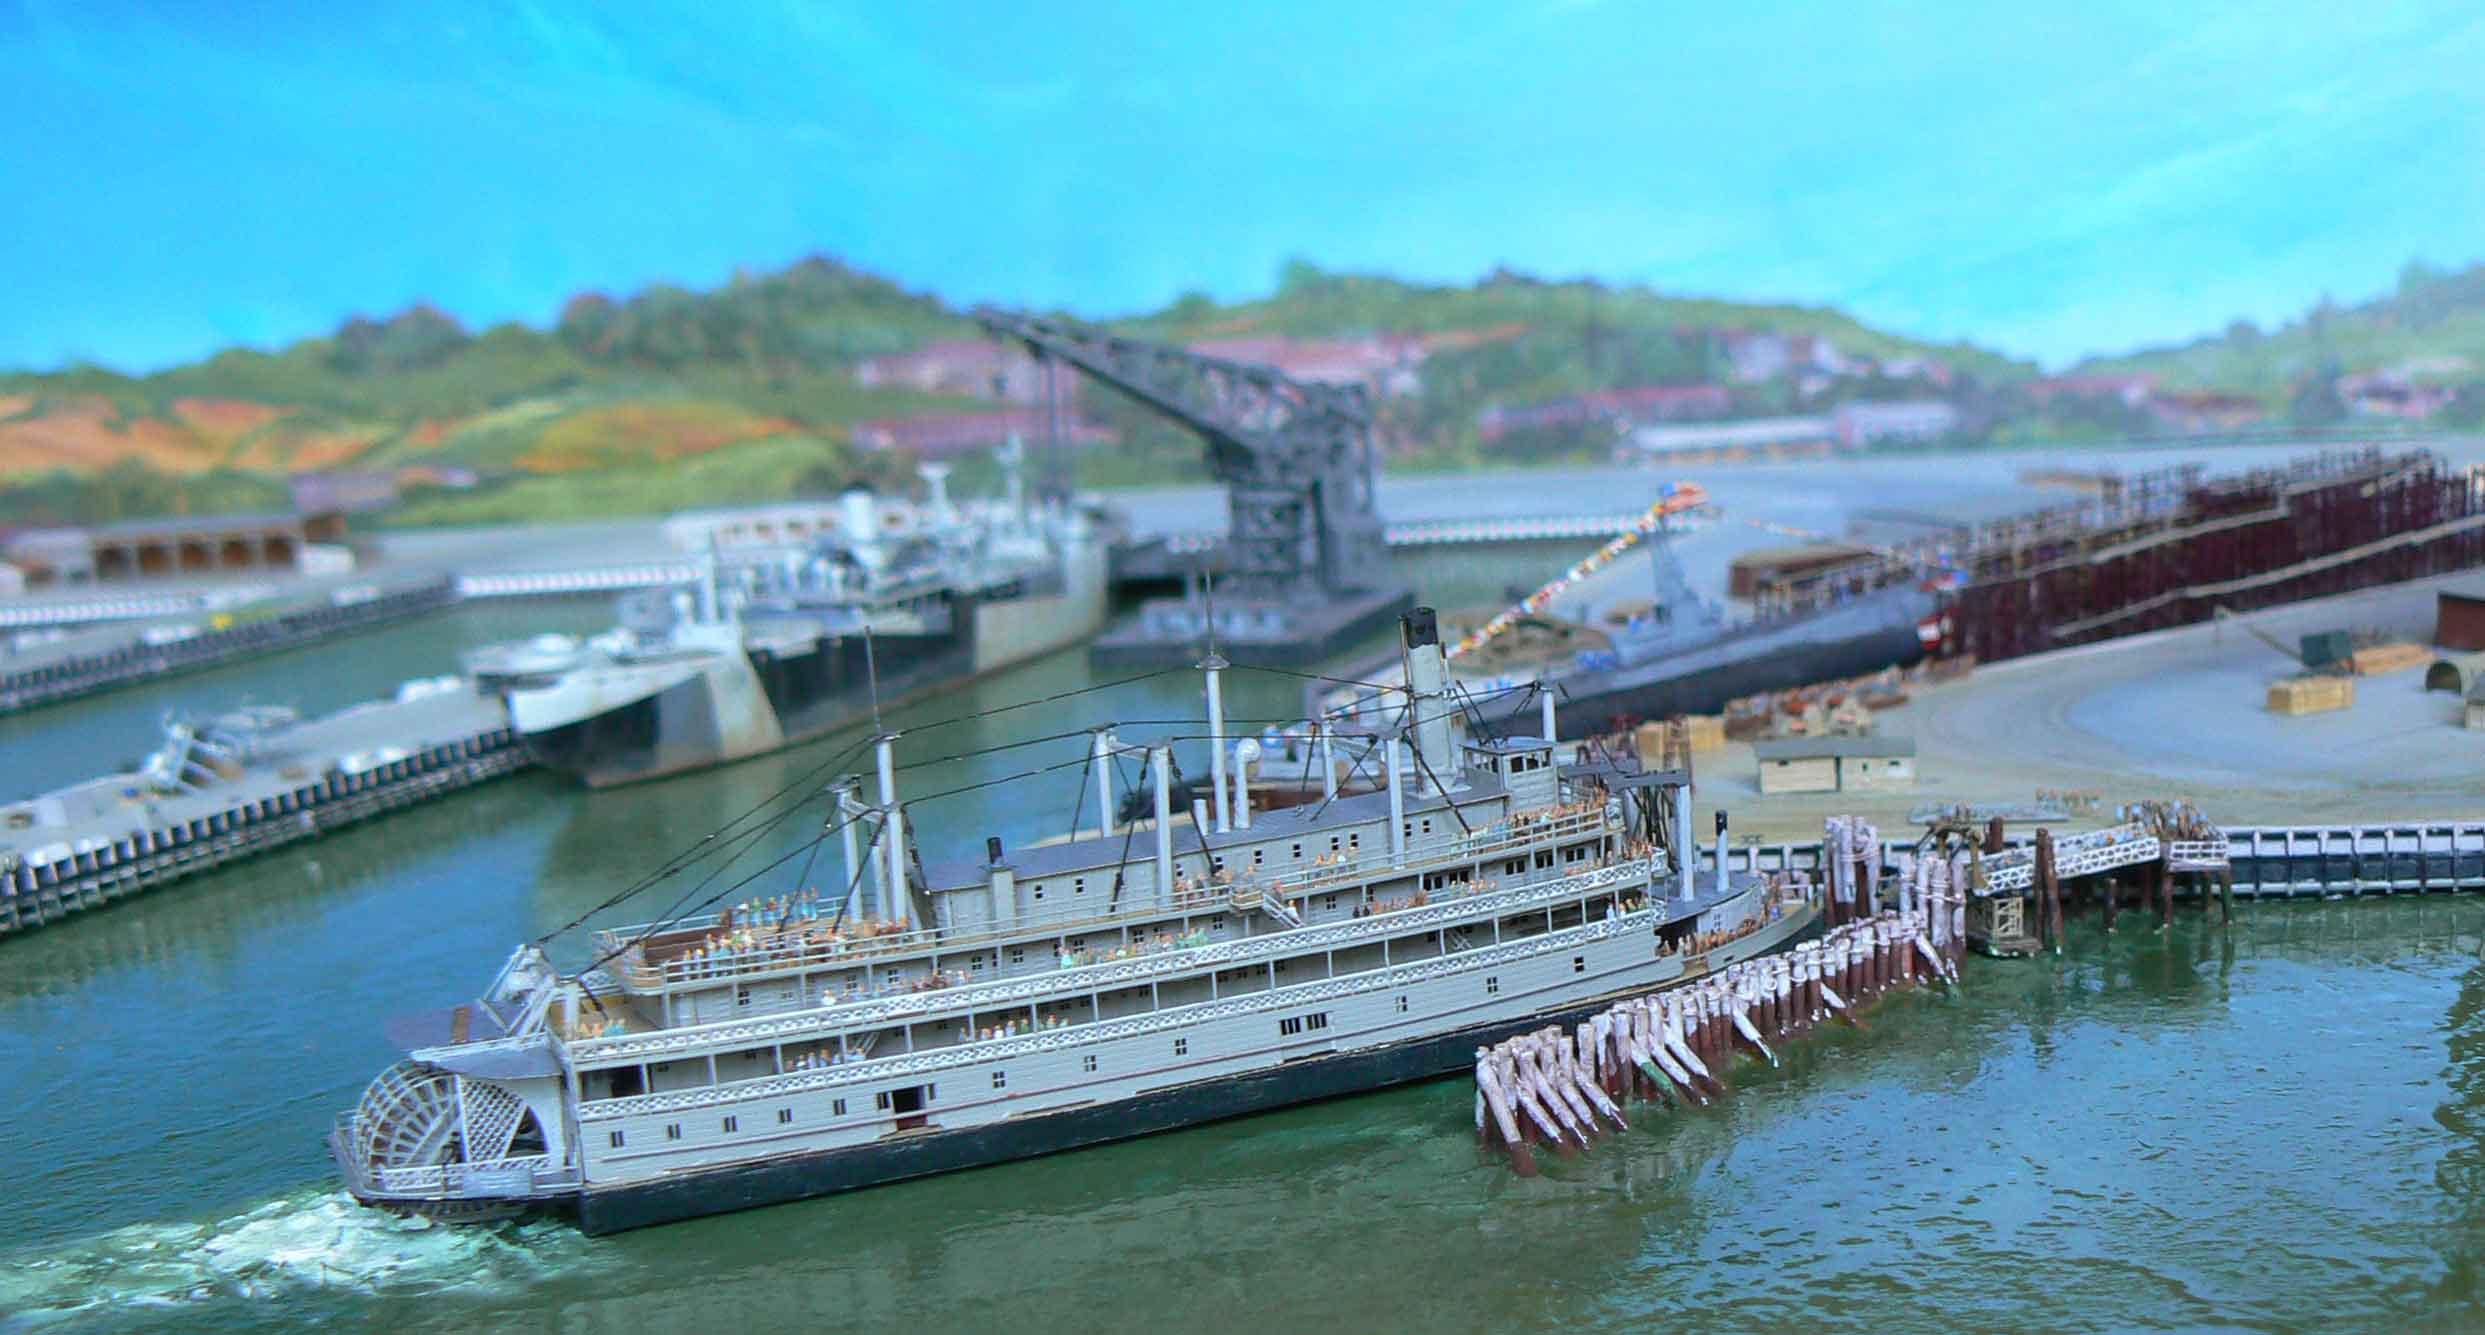 MARE ISLAND NAVAL SHIP YARD  1/700 Sj5NpX